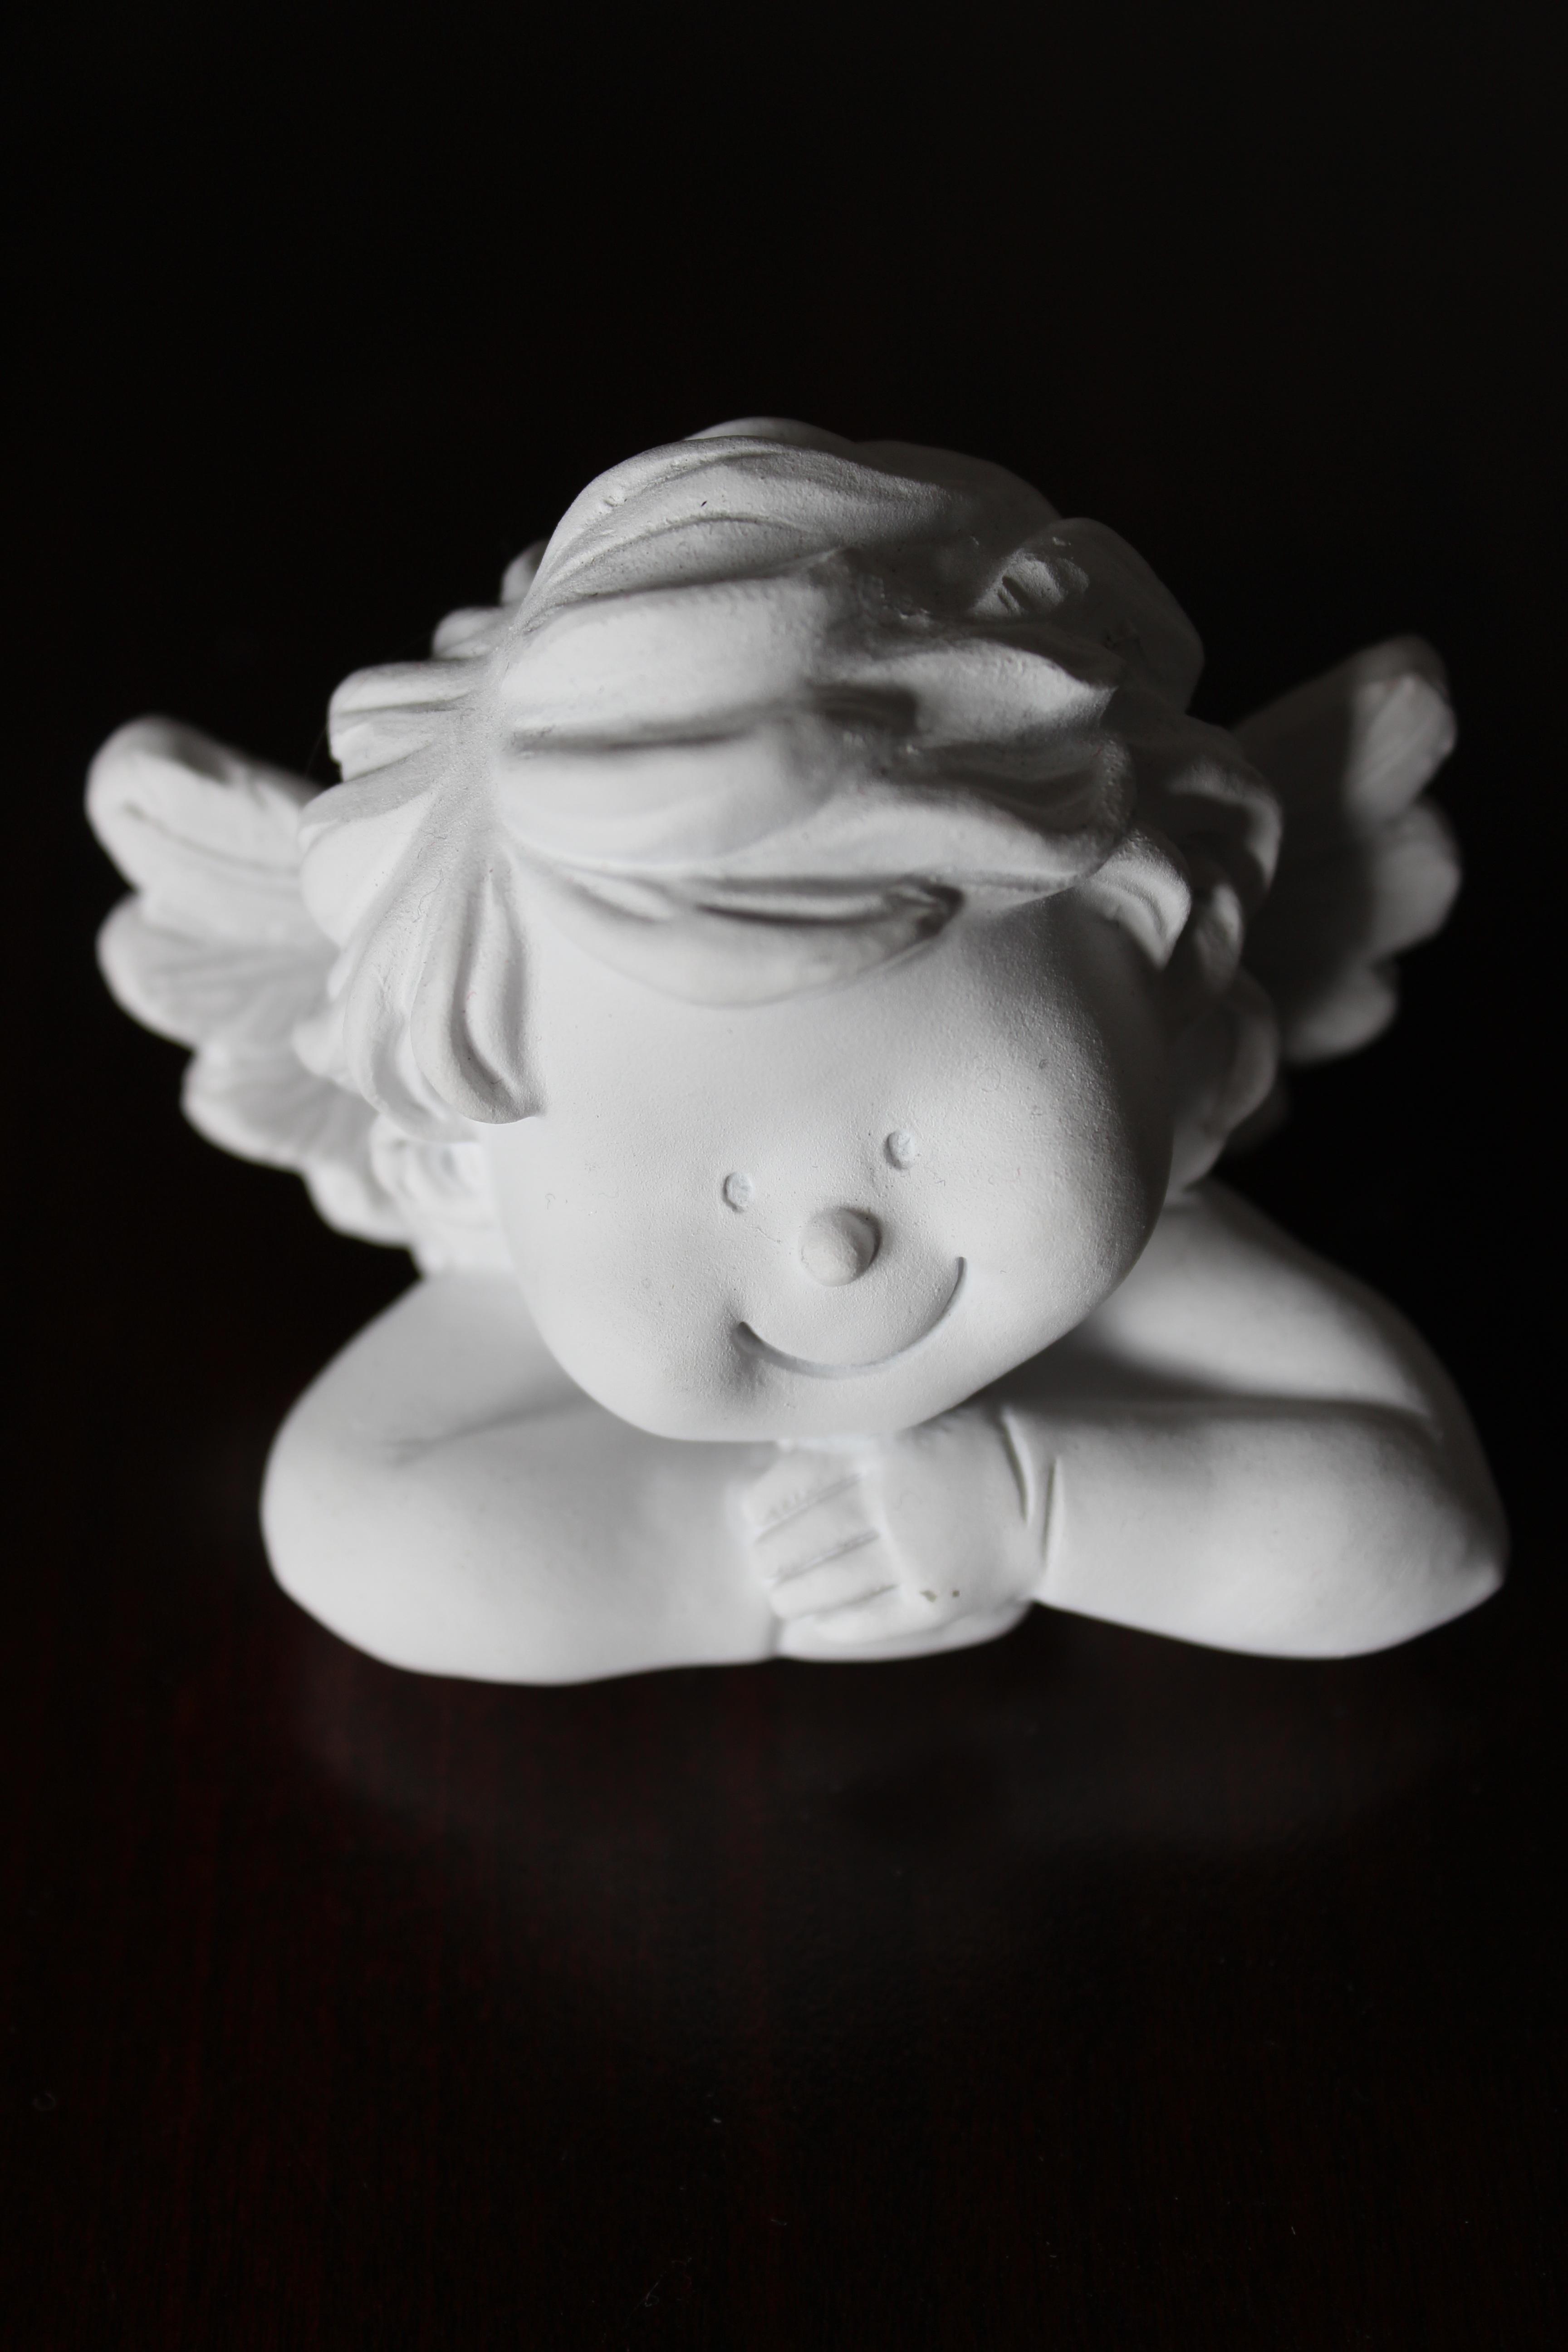 White Angel Figurine 183 Free Stock Photo